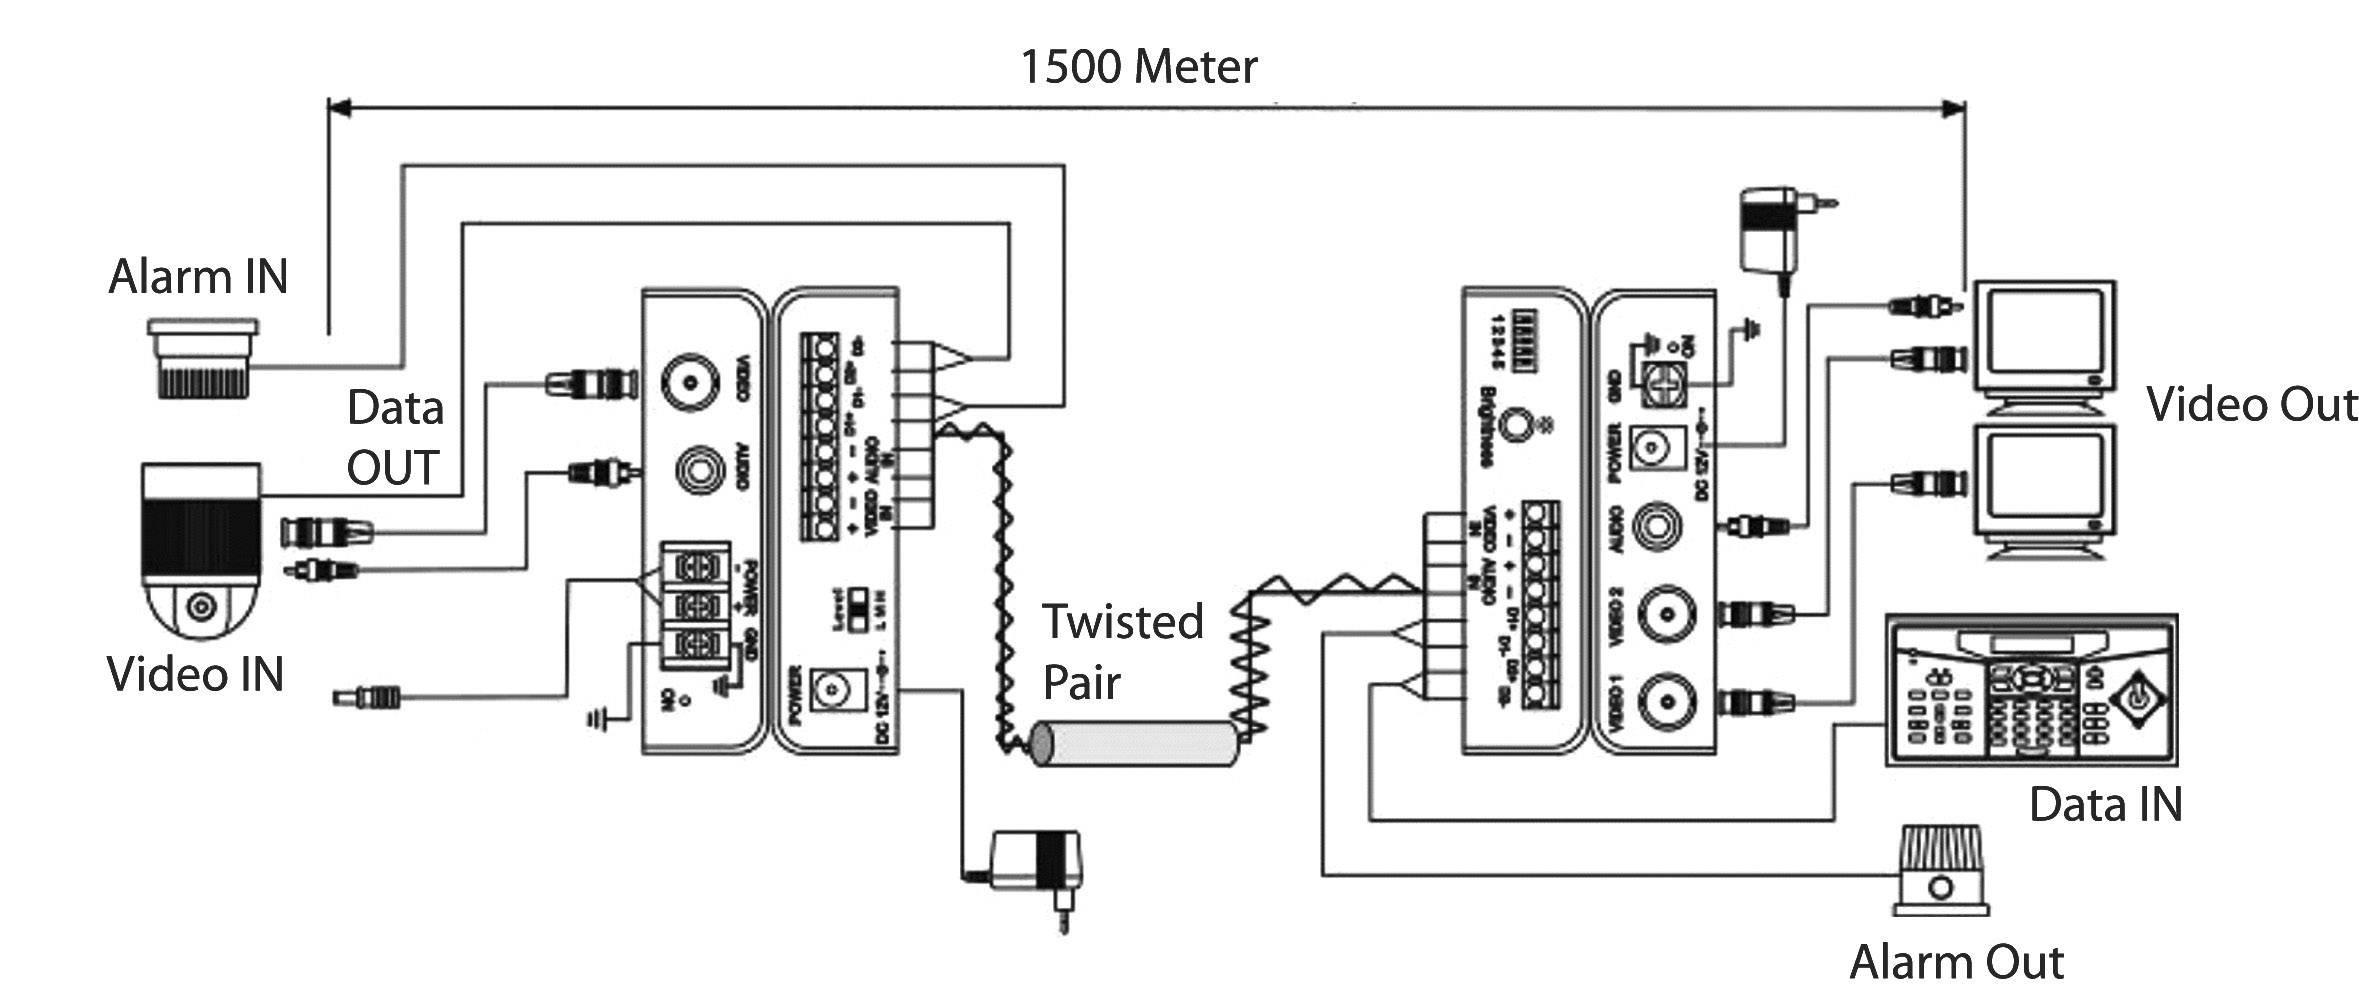 acewell wiring diagram wiring diagram automotive rh wx03 autoservice oezder de acewell ace 1500 wiring diagram acewell 4553 wiring diagram